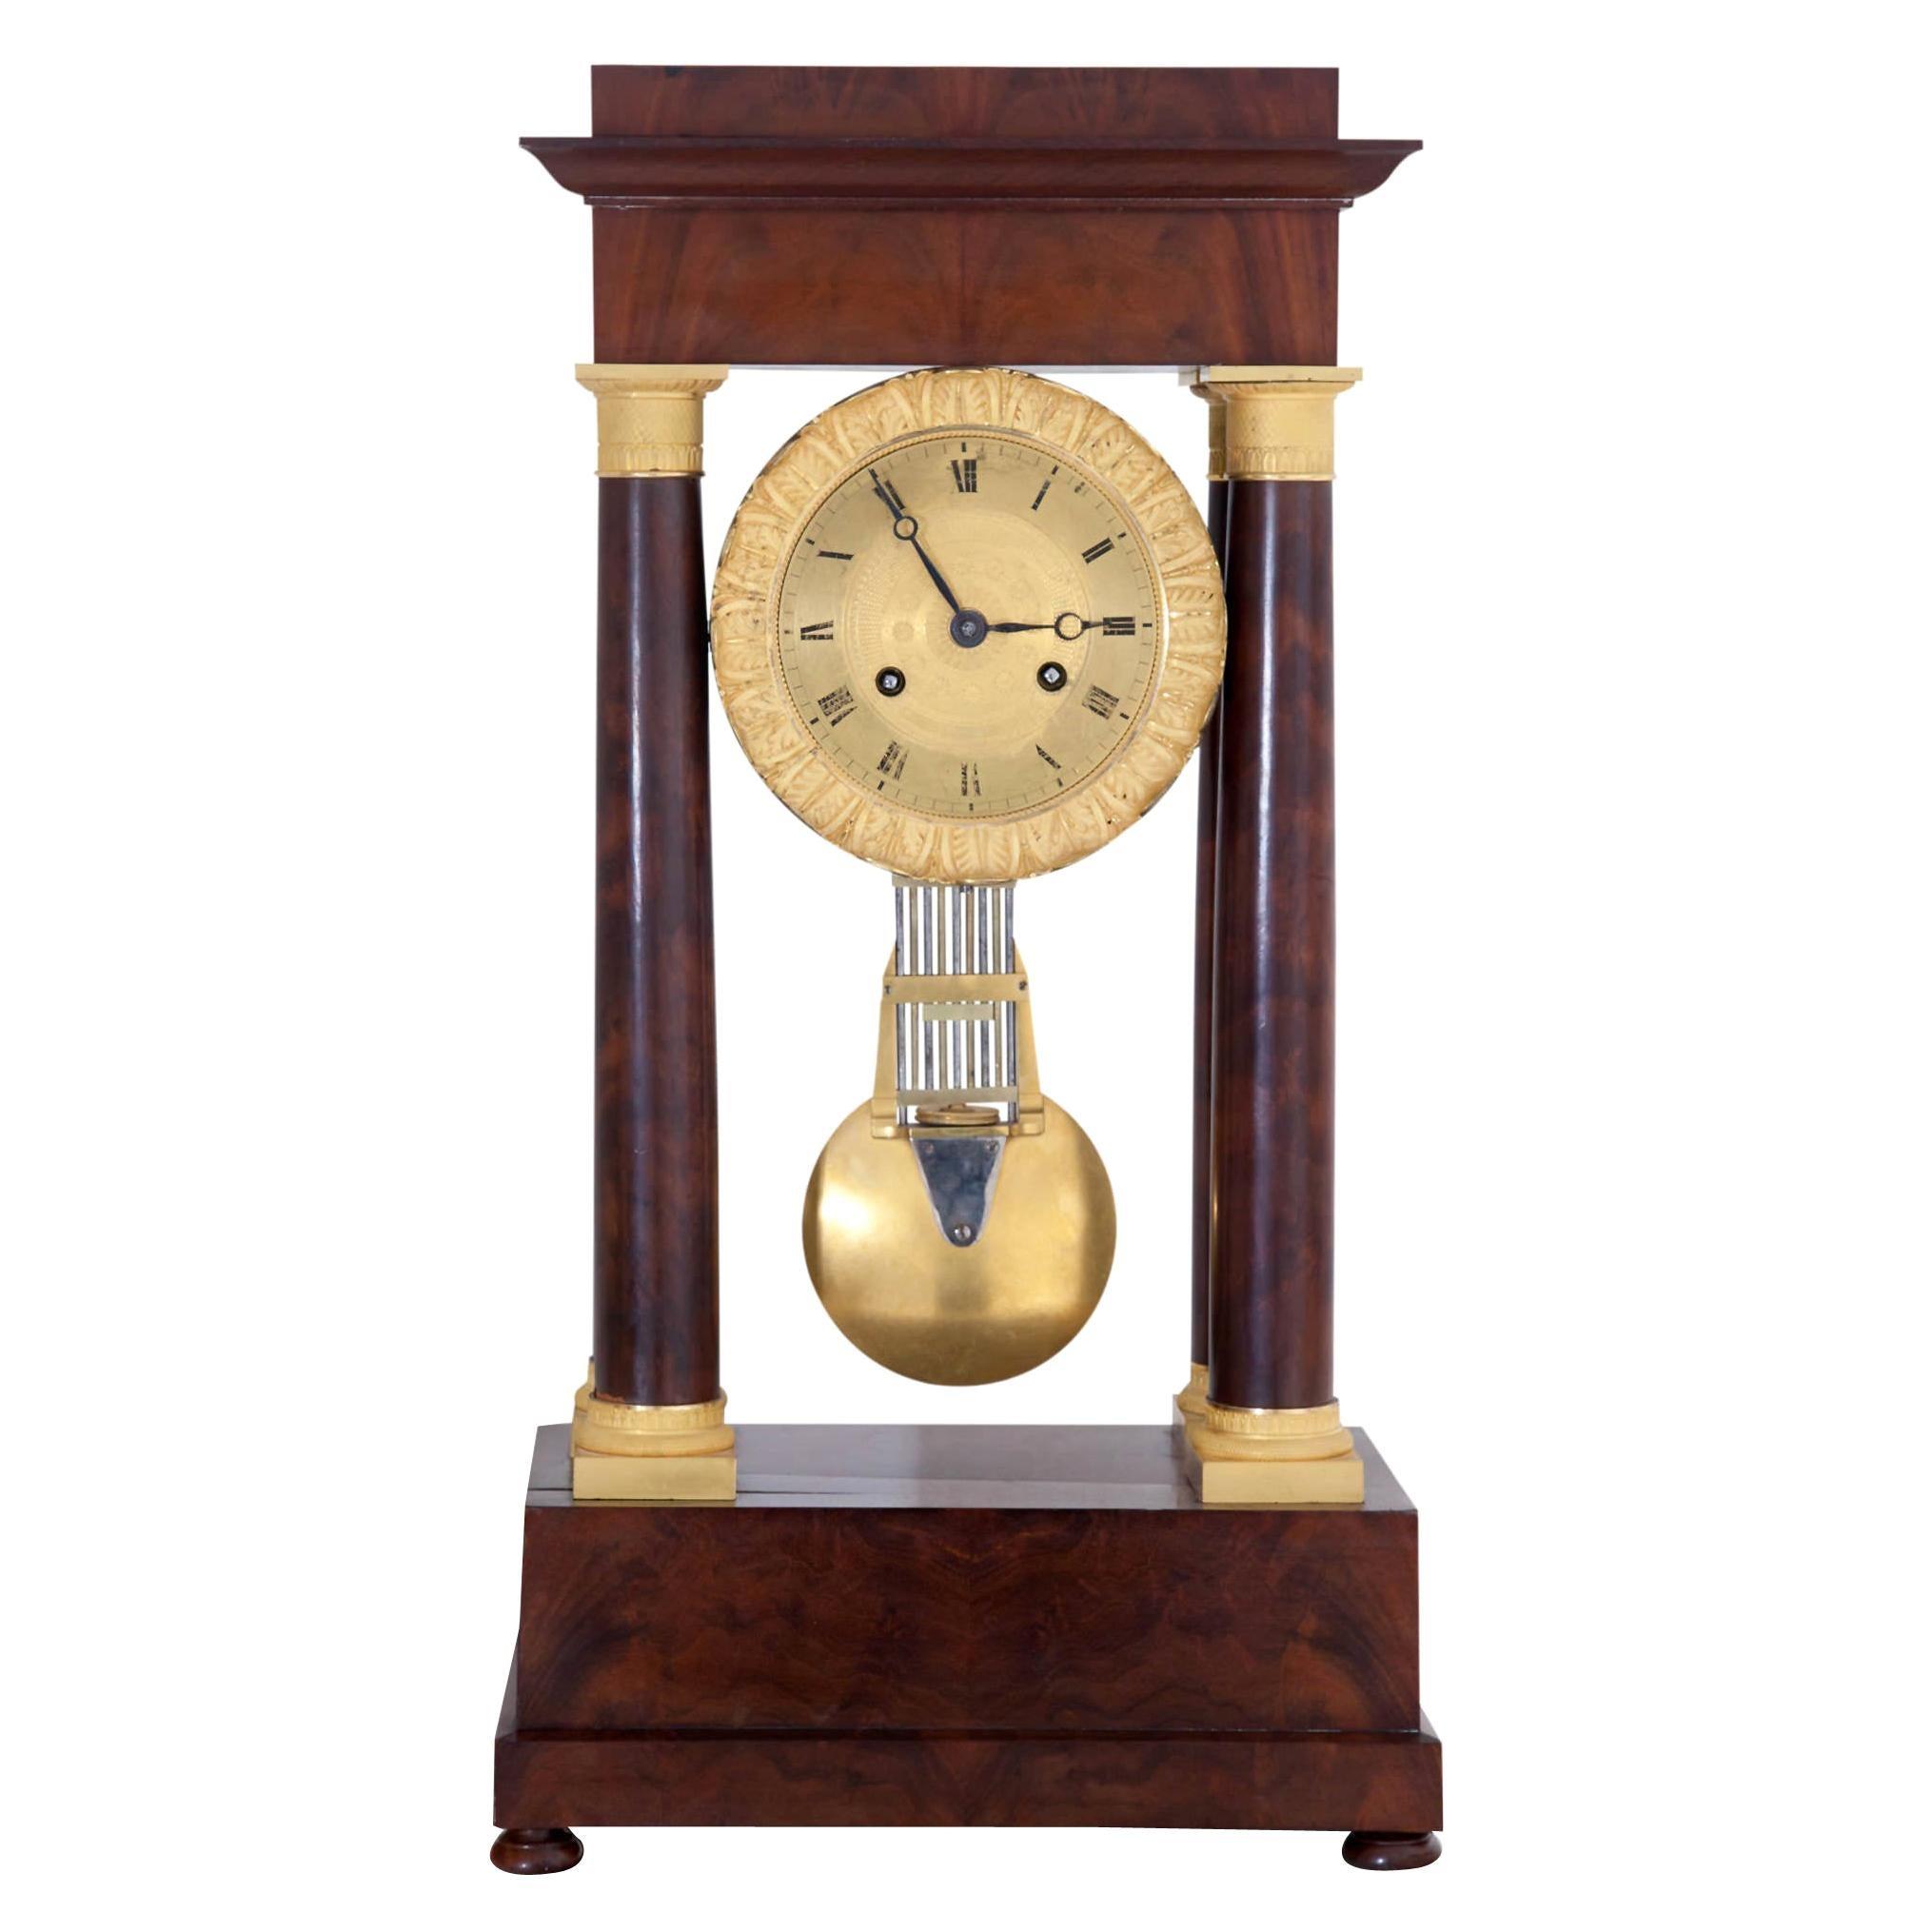 Empire Portal Clock, France, Early 19th Century